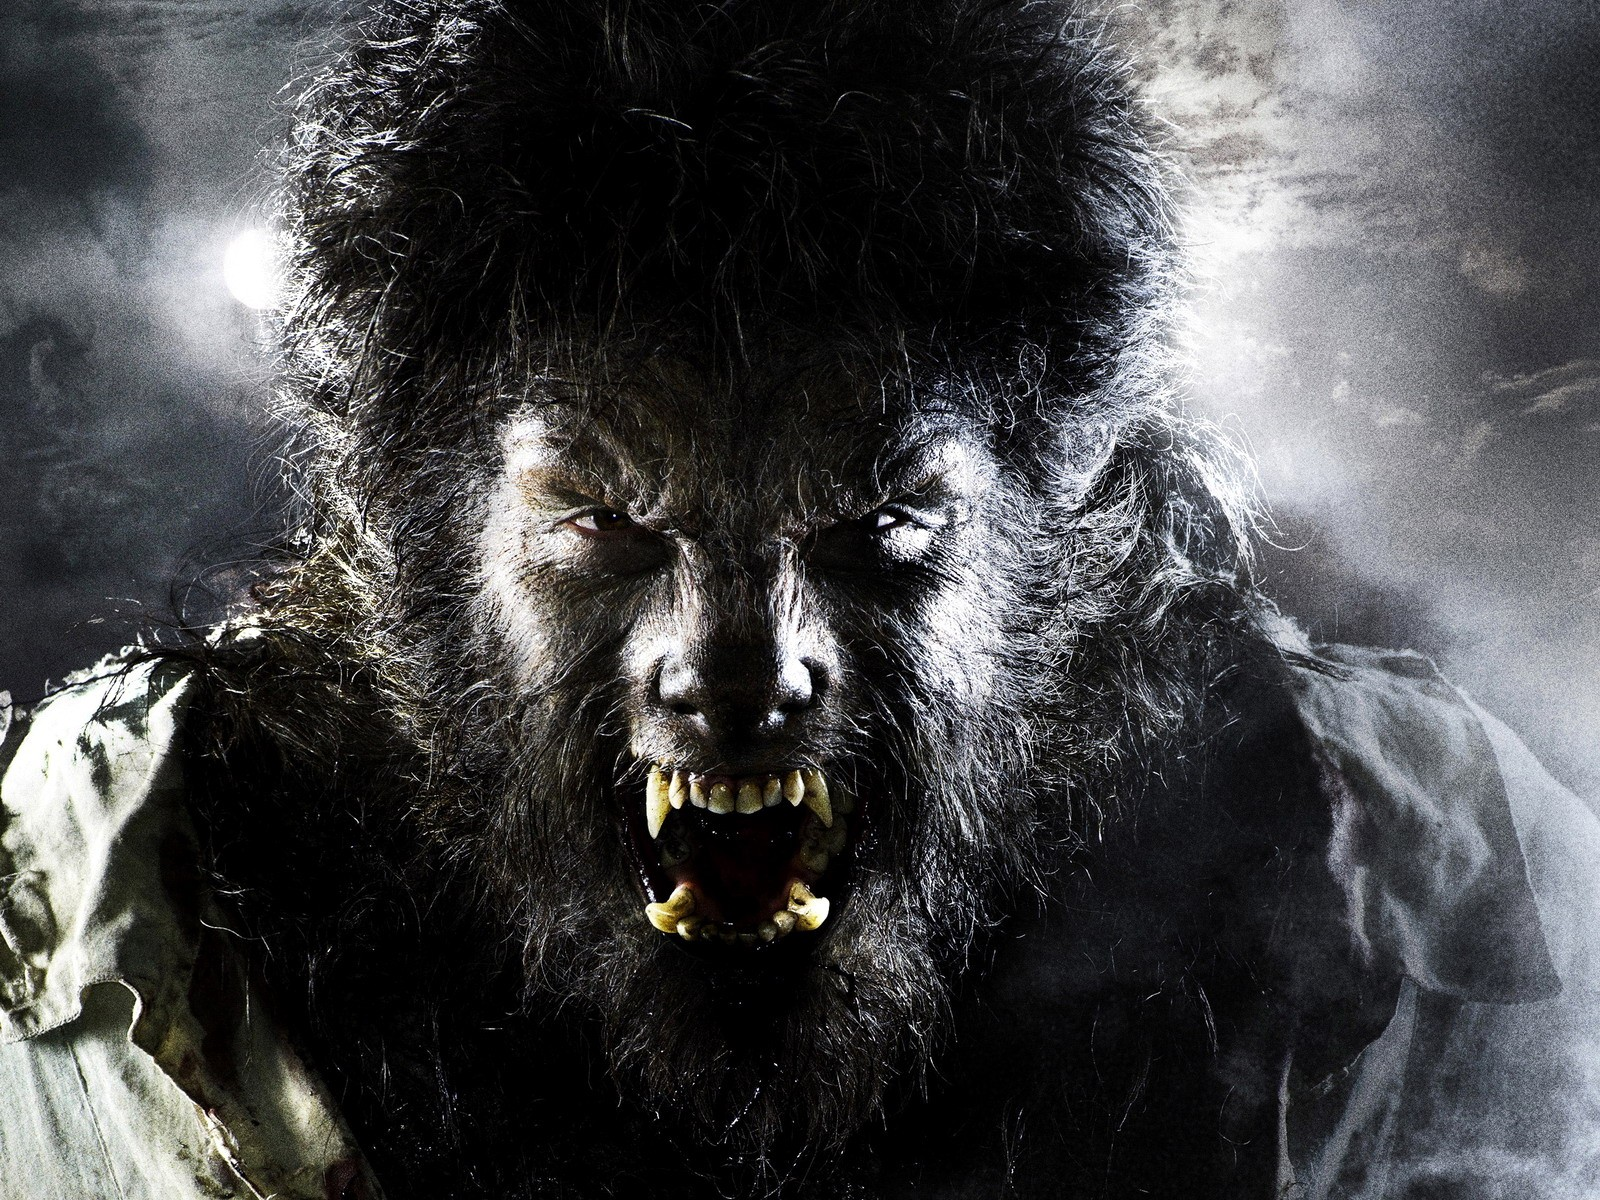 Scary Werewolf Wallpaper wallpaper wallpaper hd background desktop 1600x1200